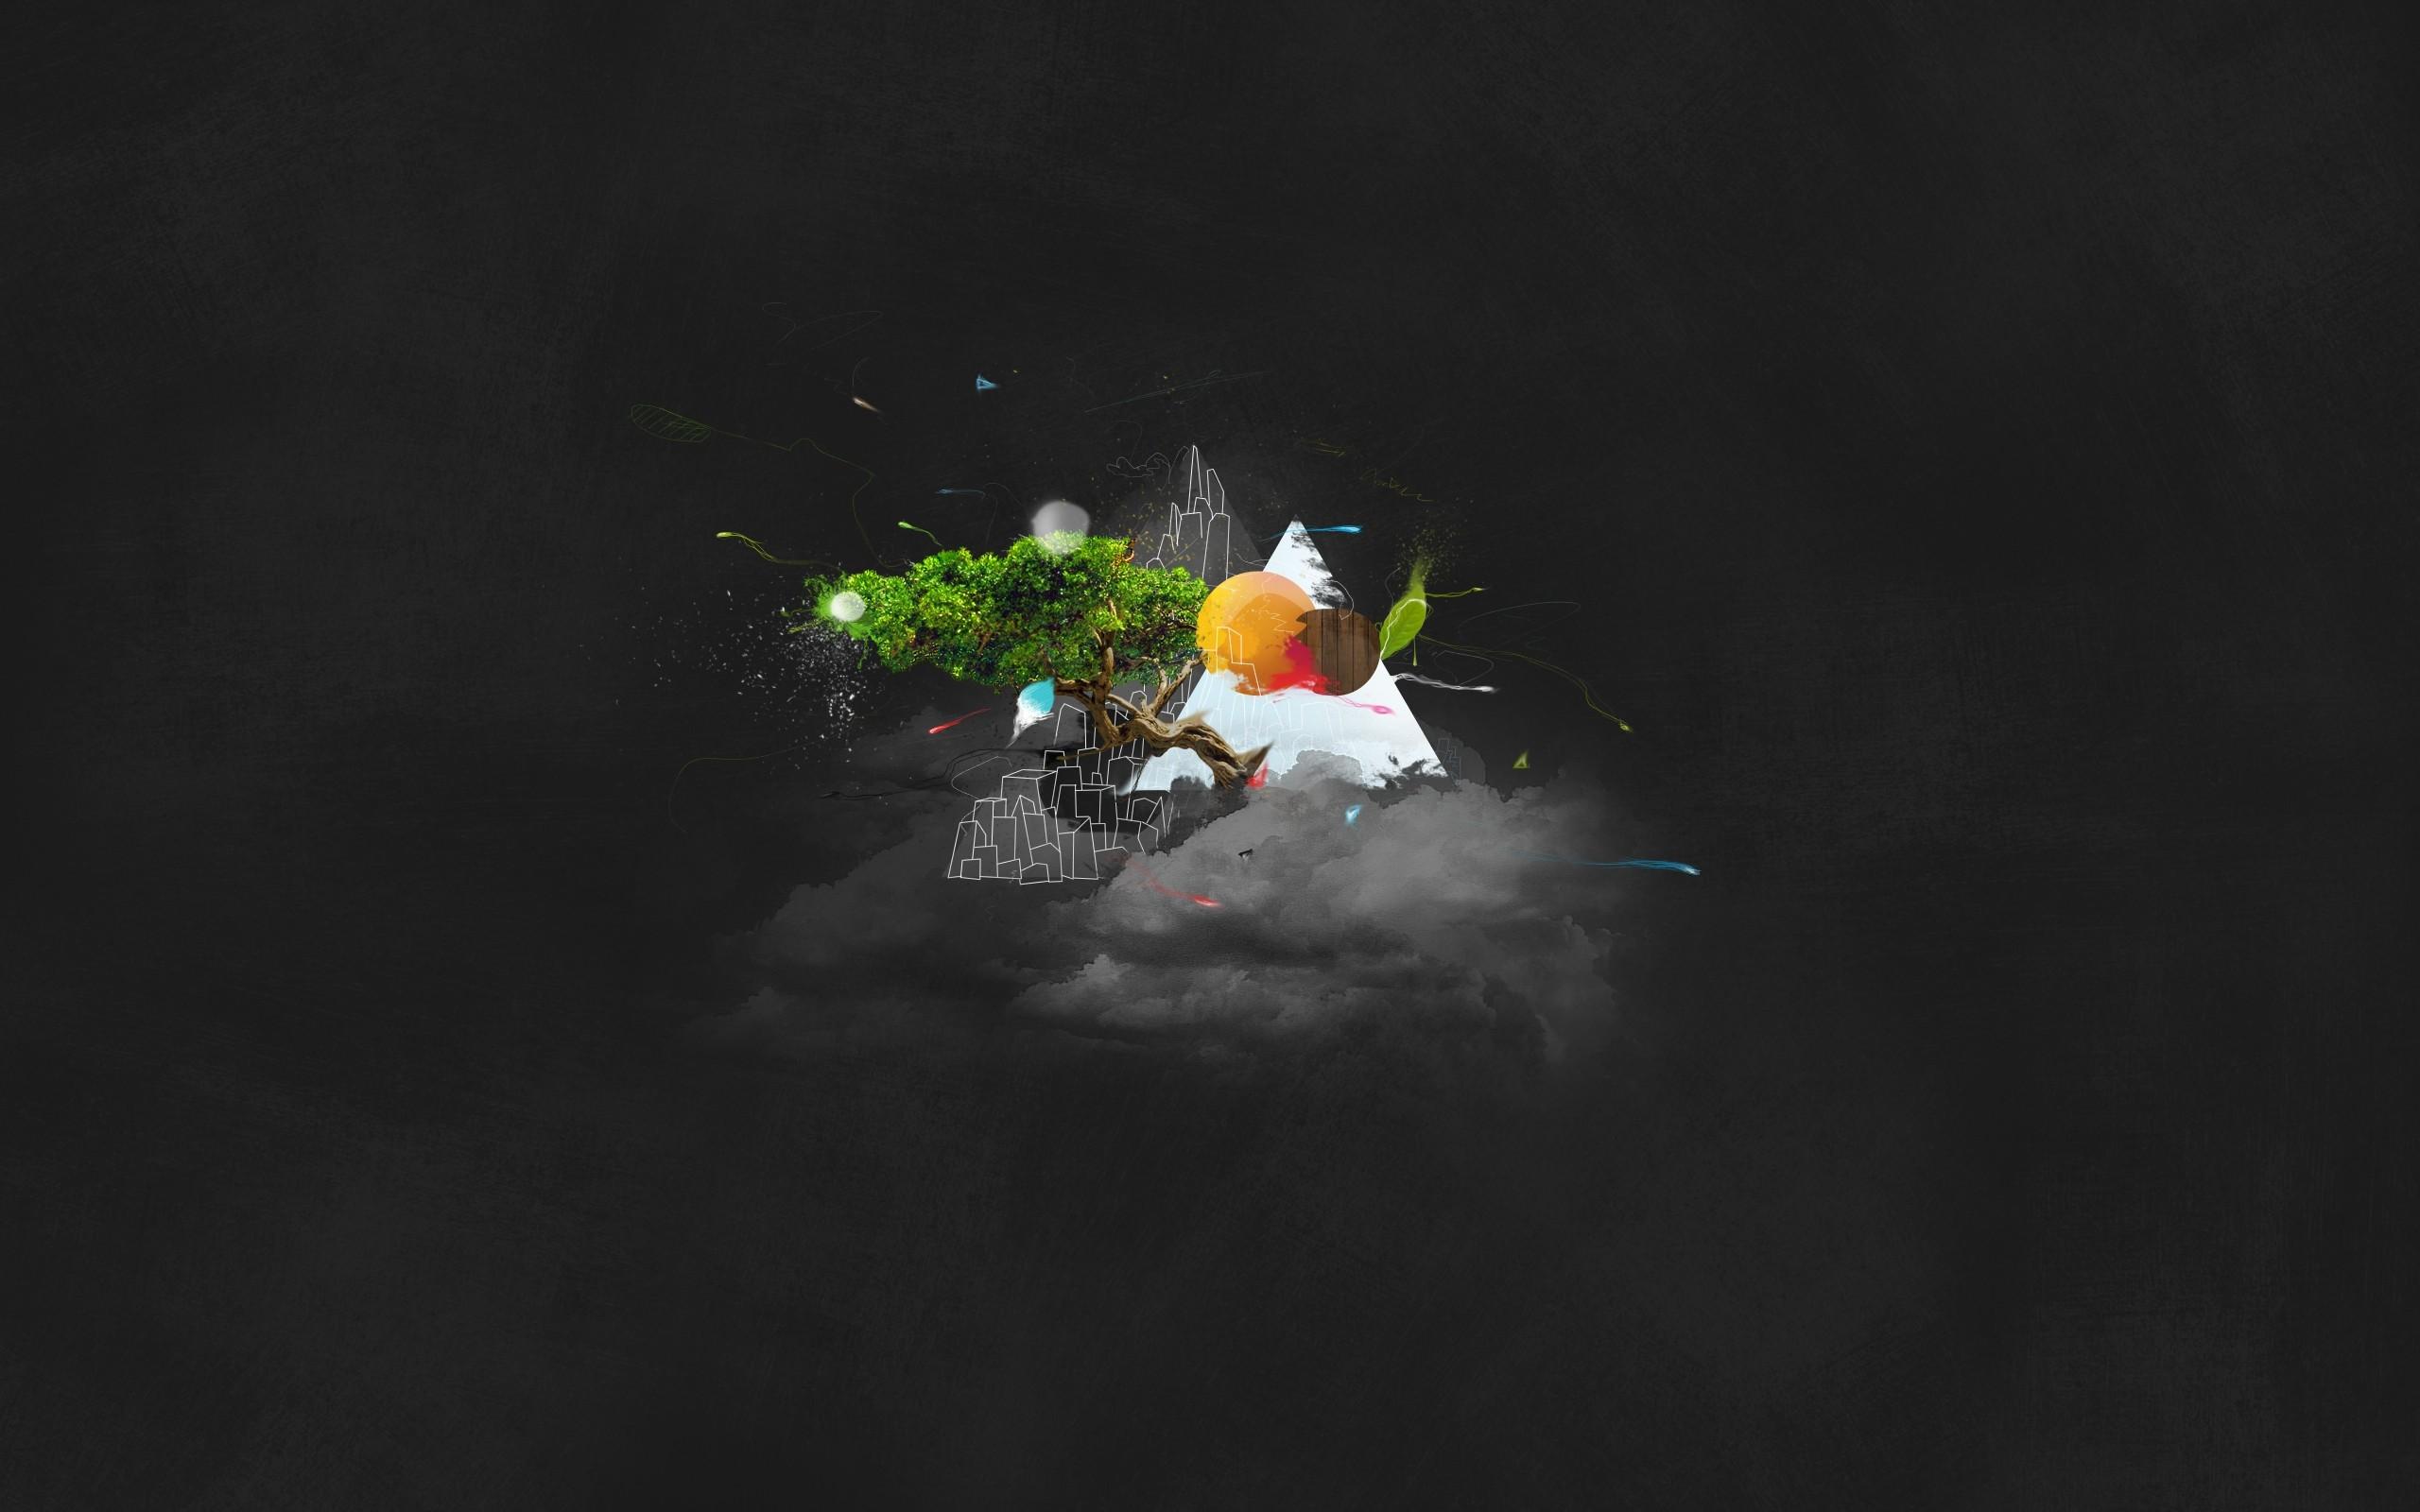 minimalist-art-poster-uhd-wallpapers.jpg (2560×1600)